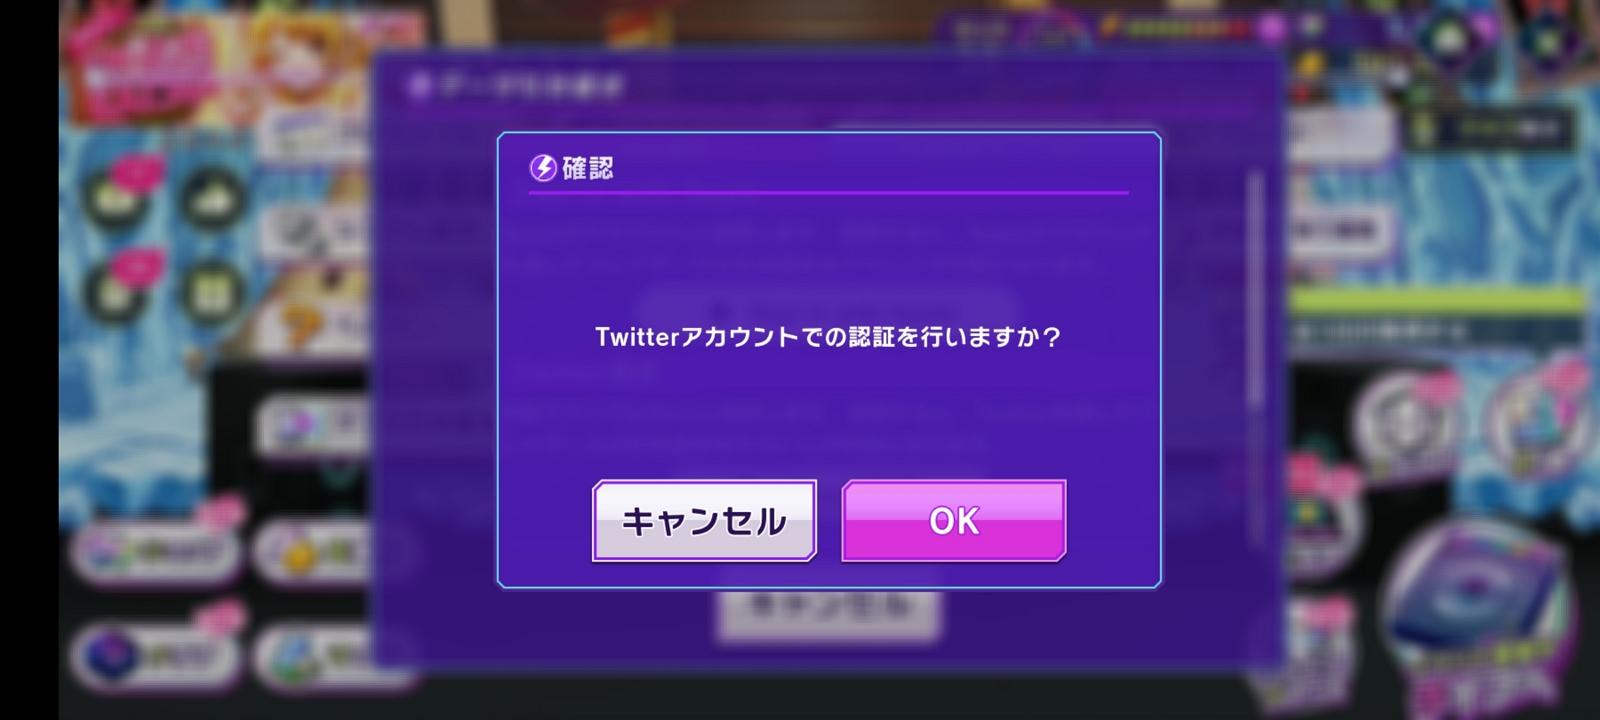 【Twitter連携】について